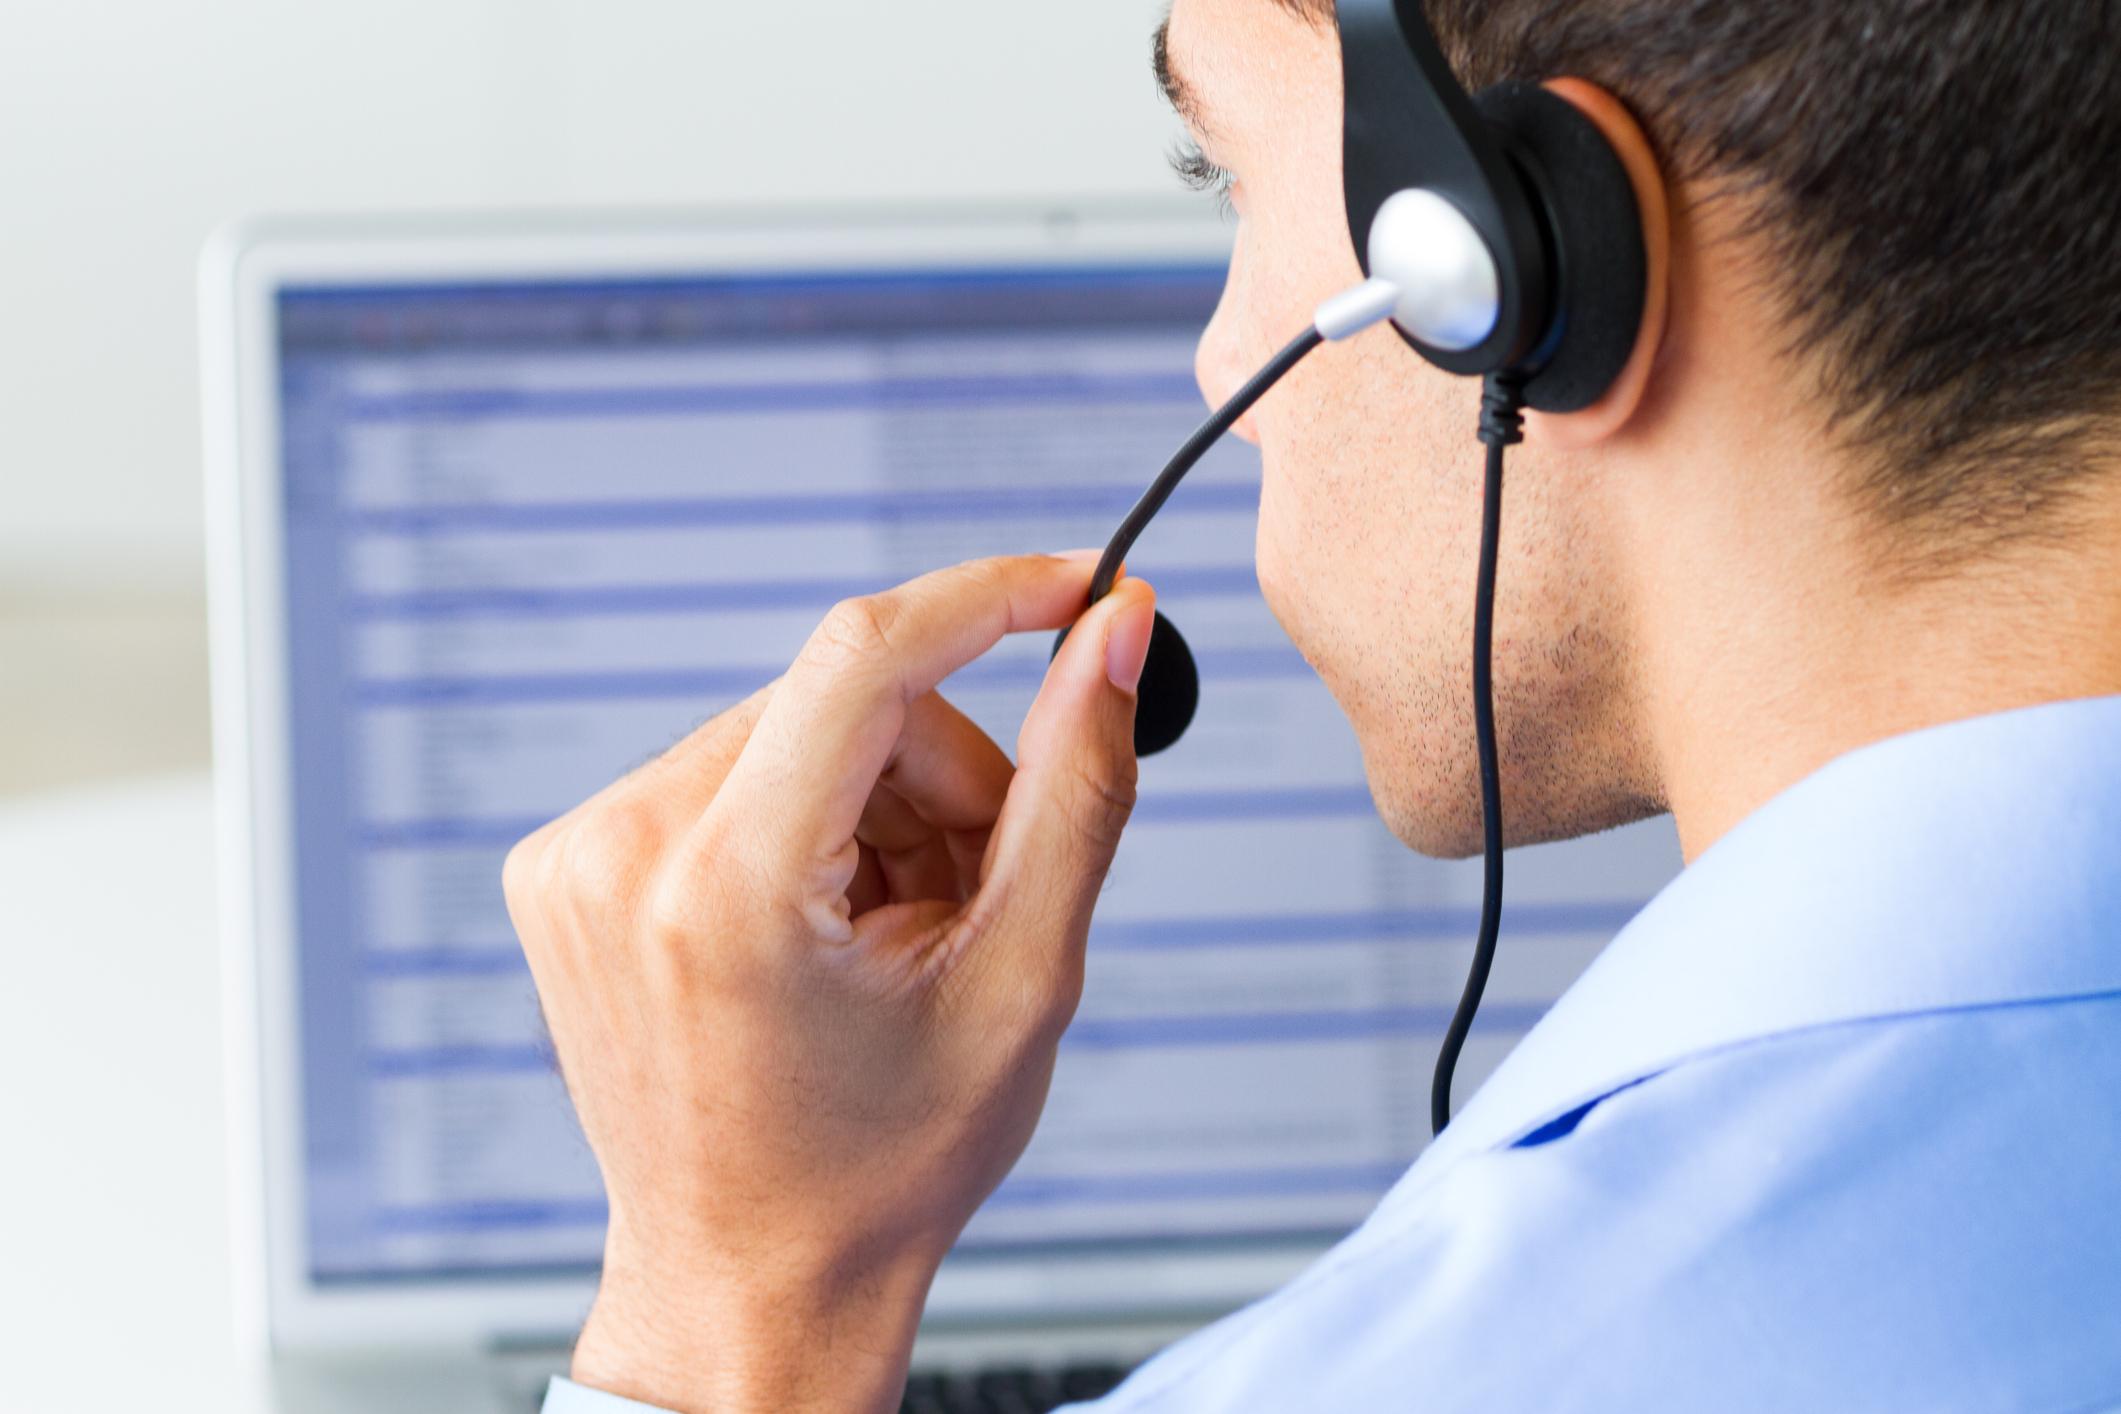 A customer service representative talking on a handset.